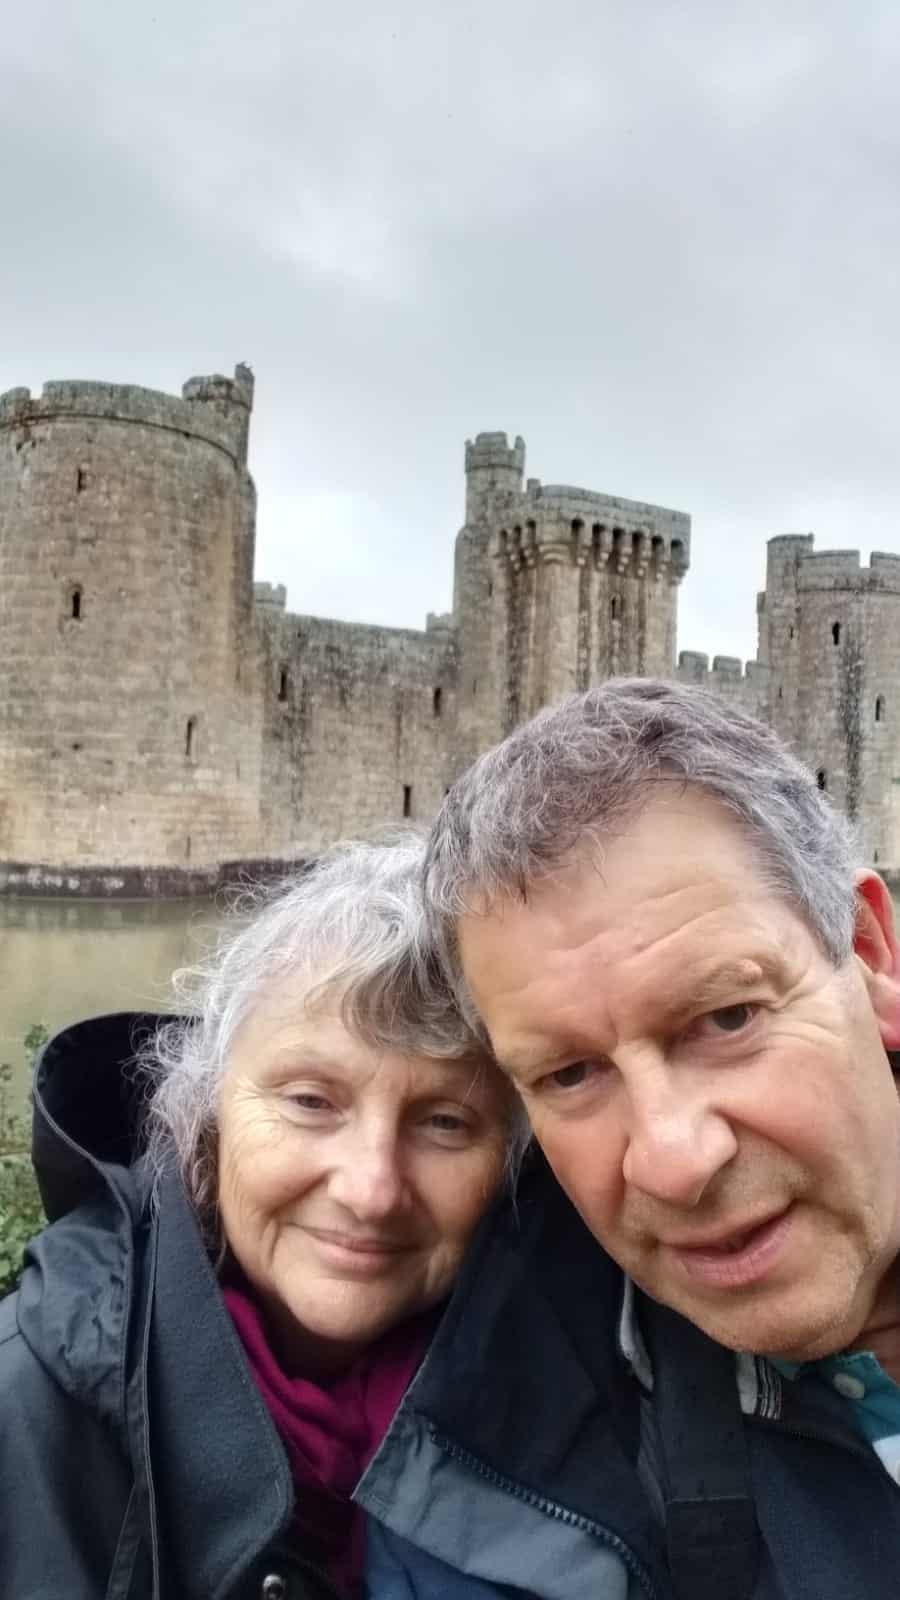 Carol in front of castle